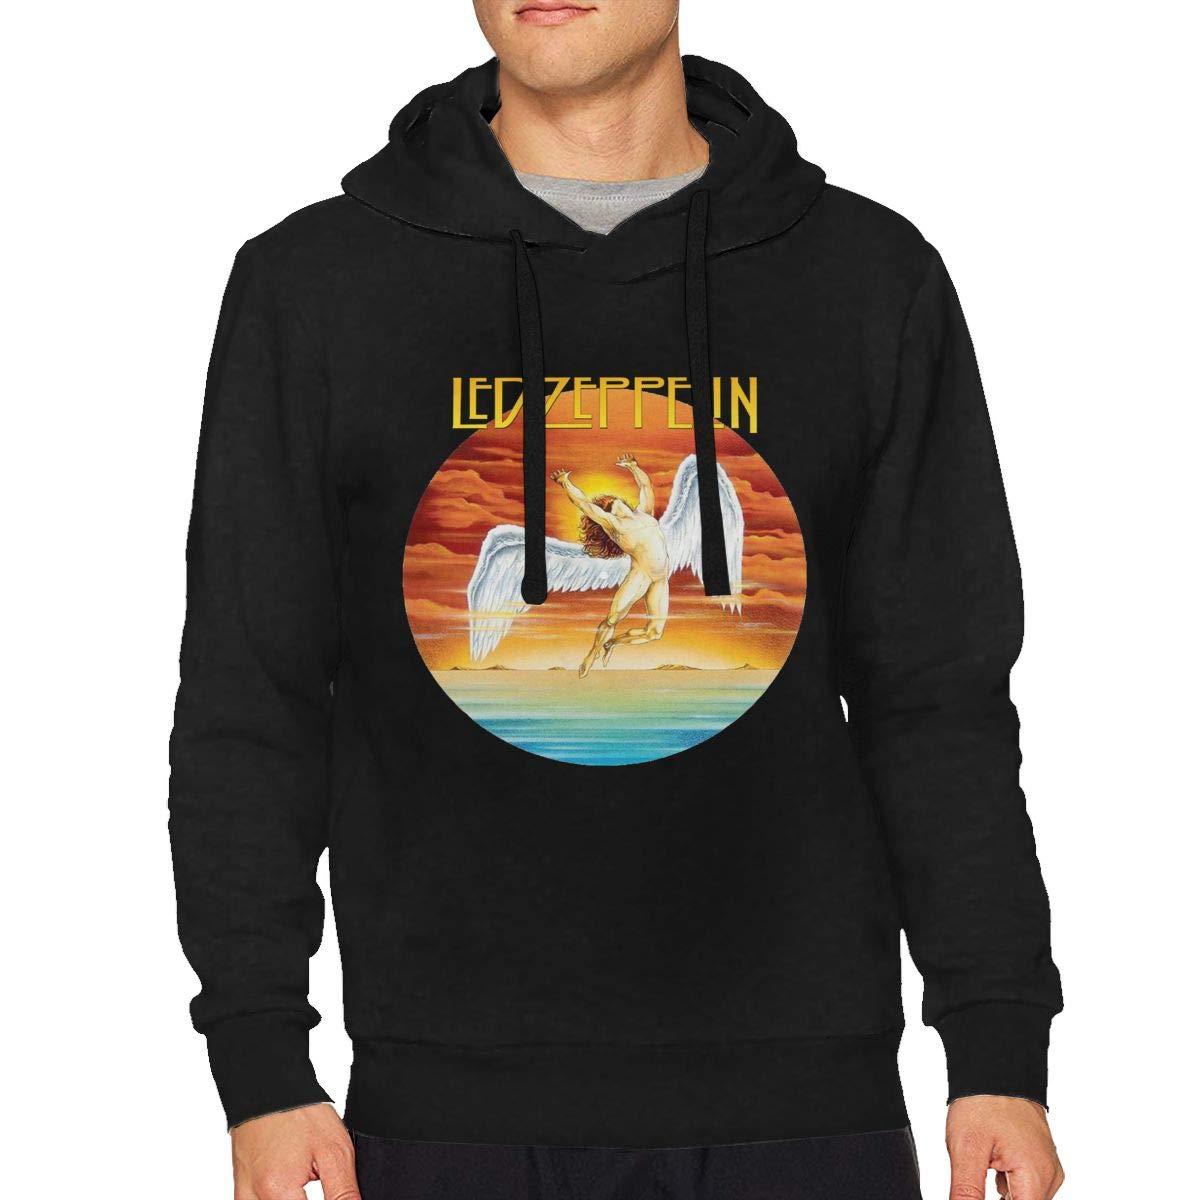 FHJEyh3 Led Zeppelin Unisex Adult Hoodie Hooded Sweatshirt Sizes S-3XL